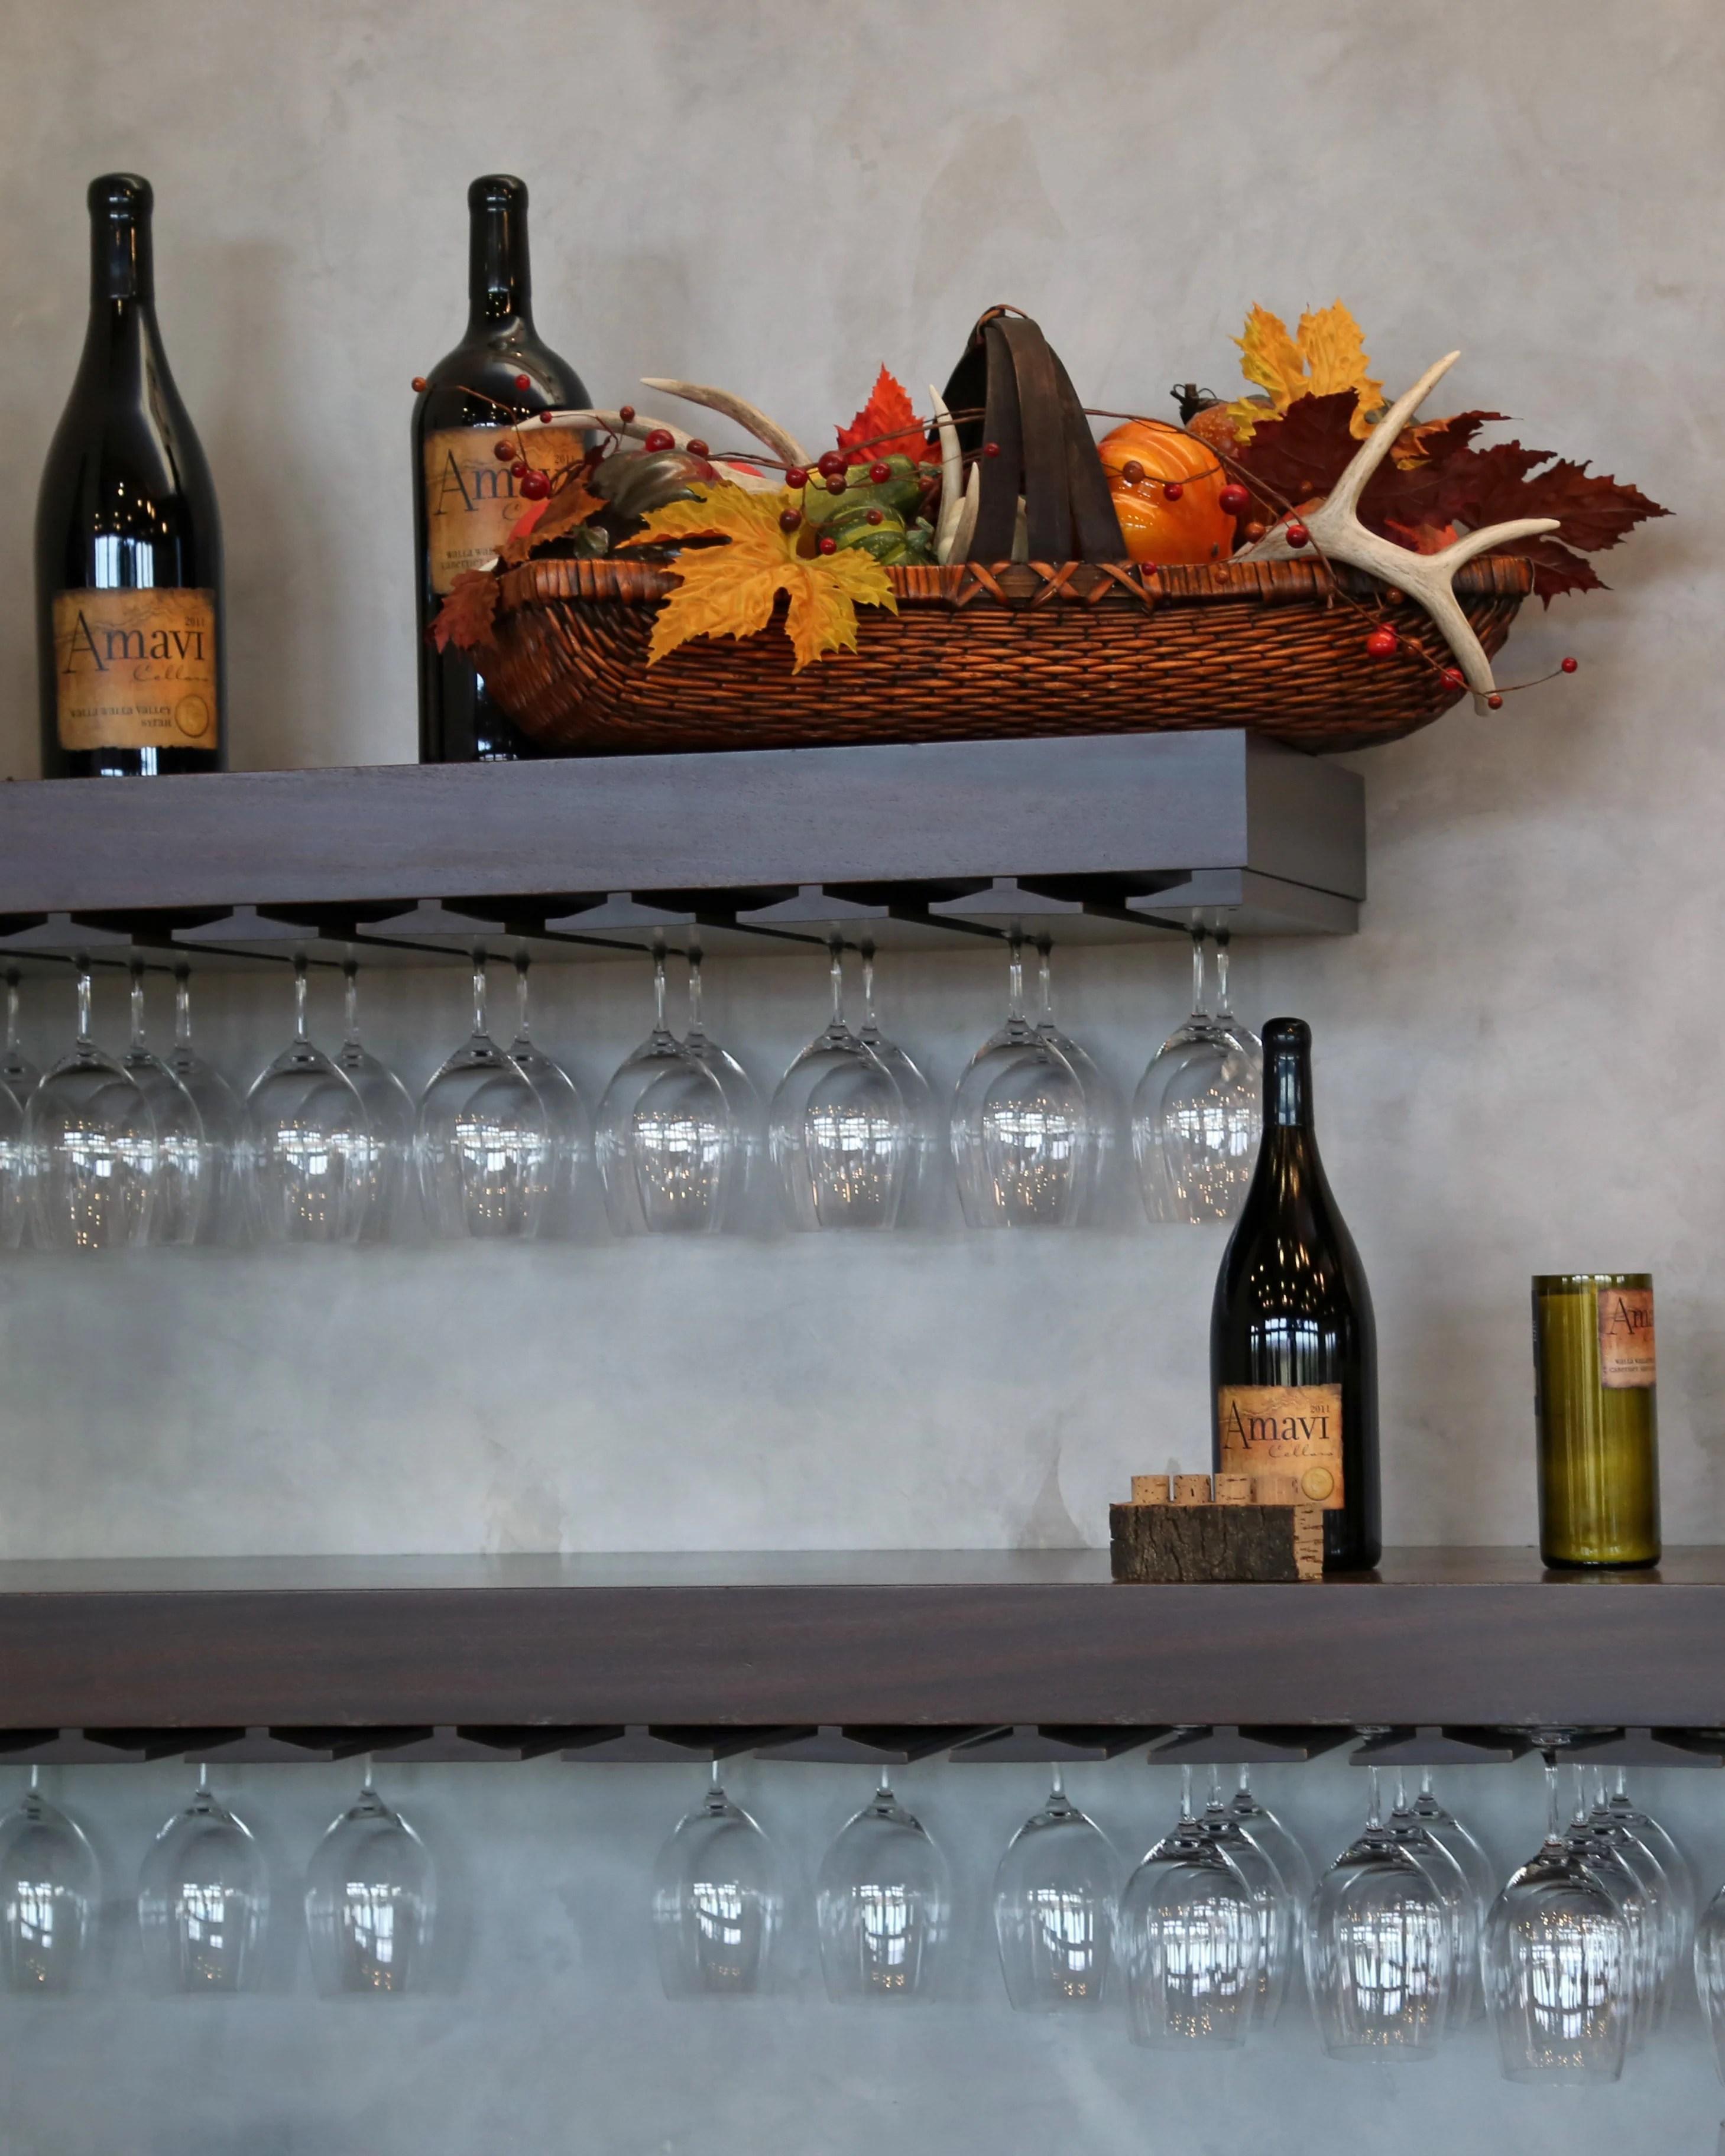 wine and glasses Amavi Cellars Walla Walla Washington & Amavi Cellars Walla Walla Winery